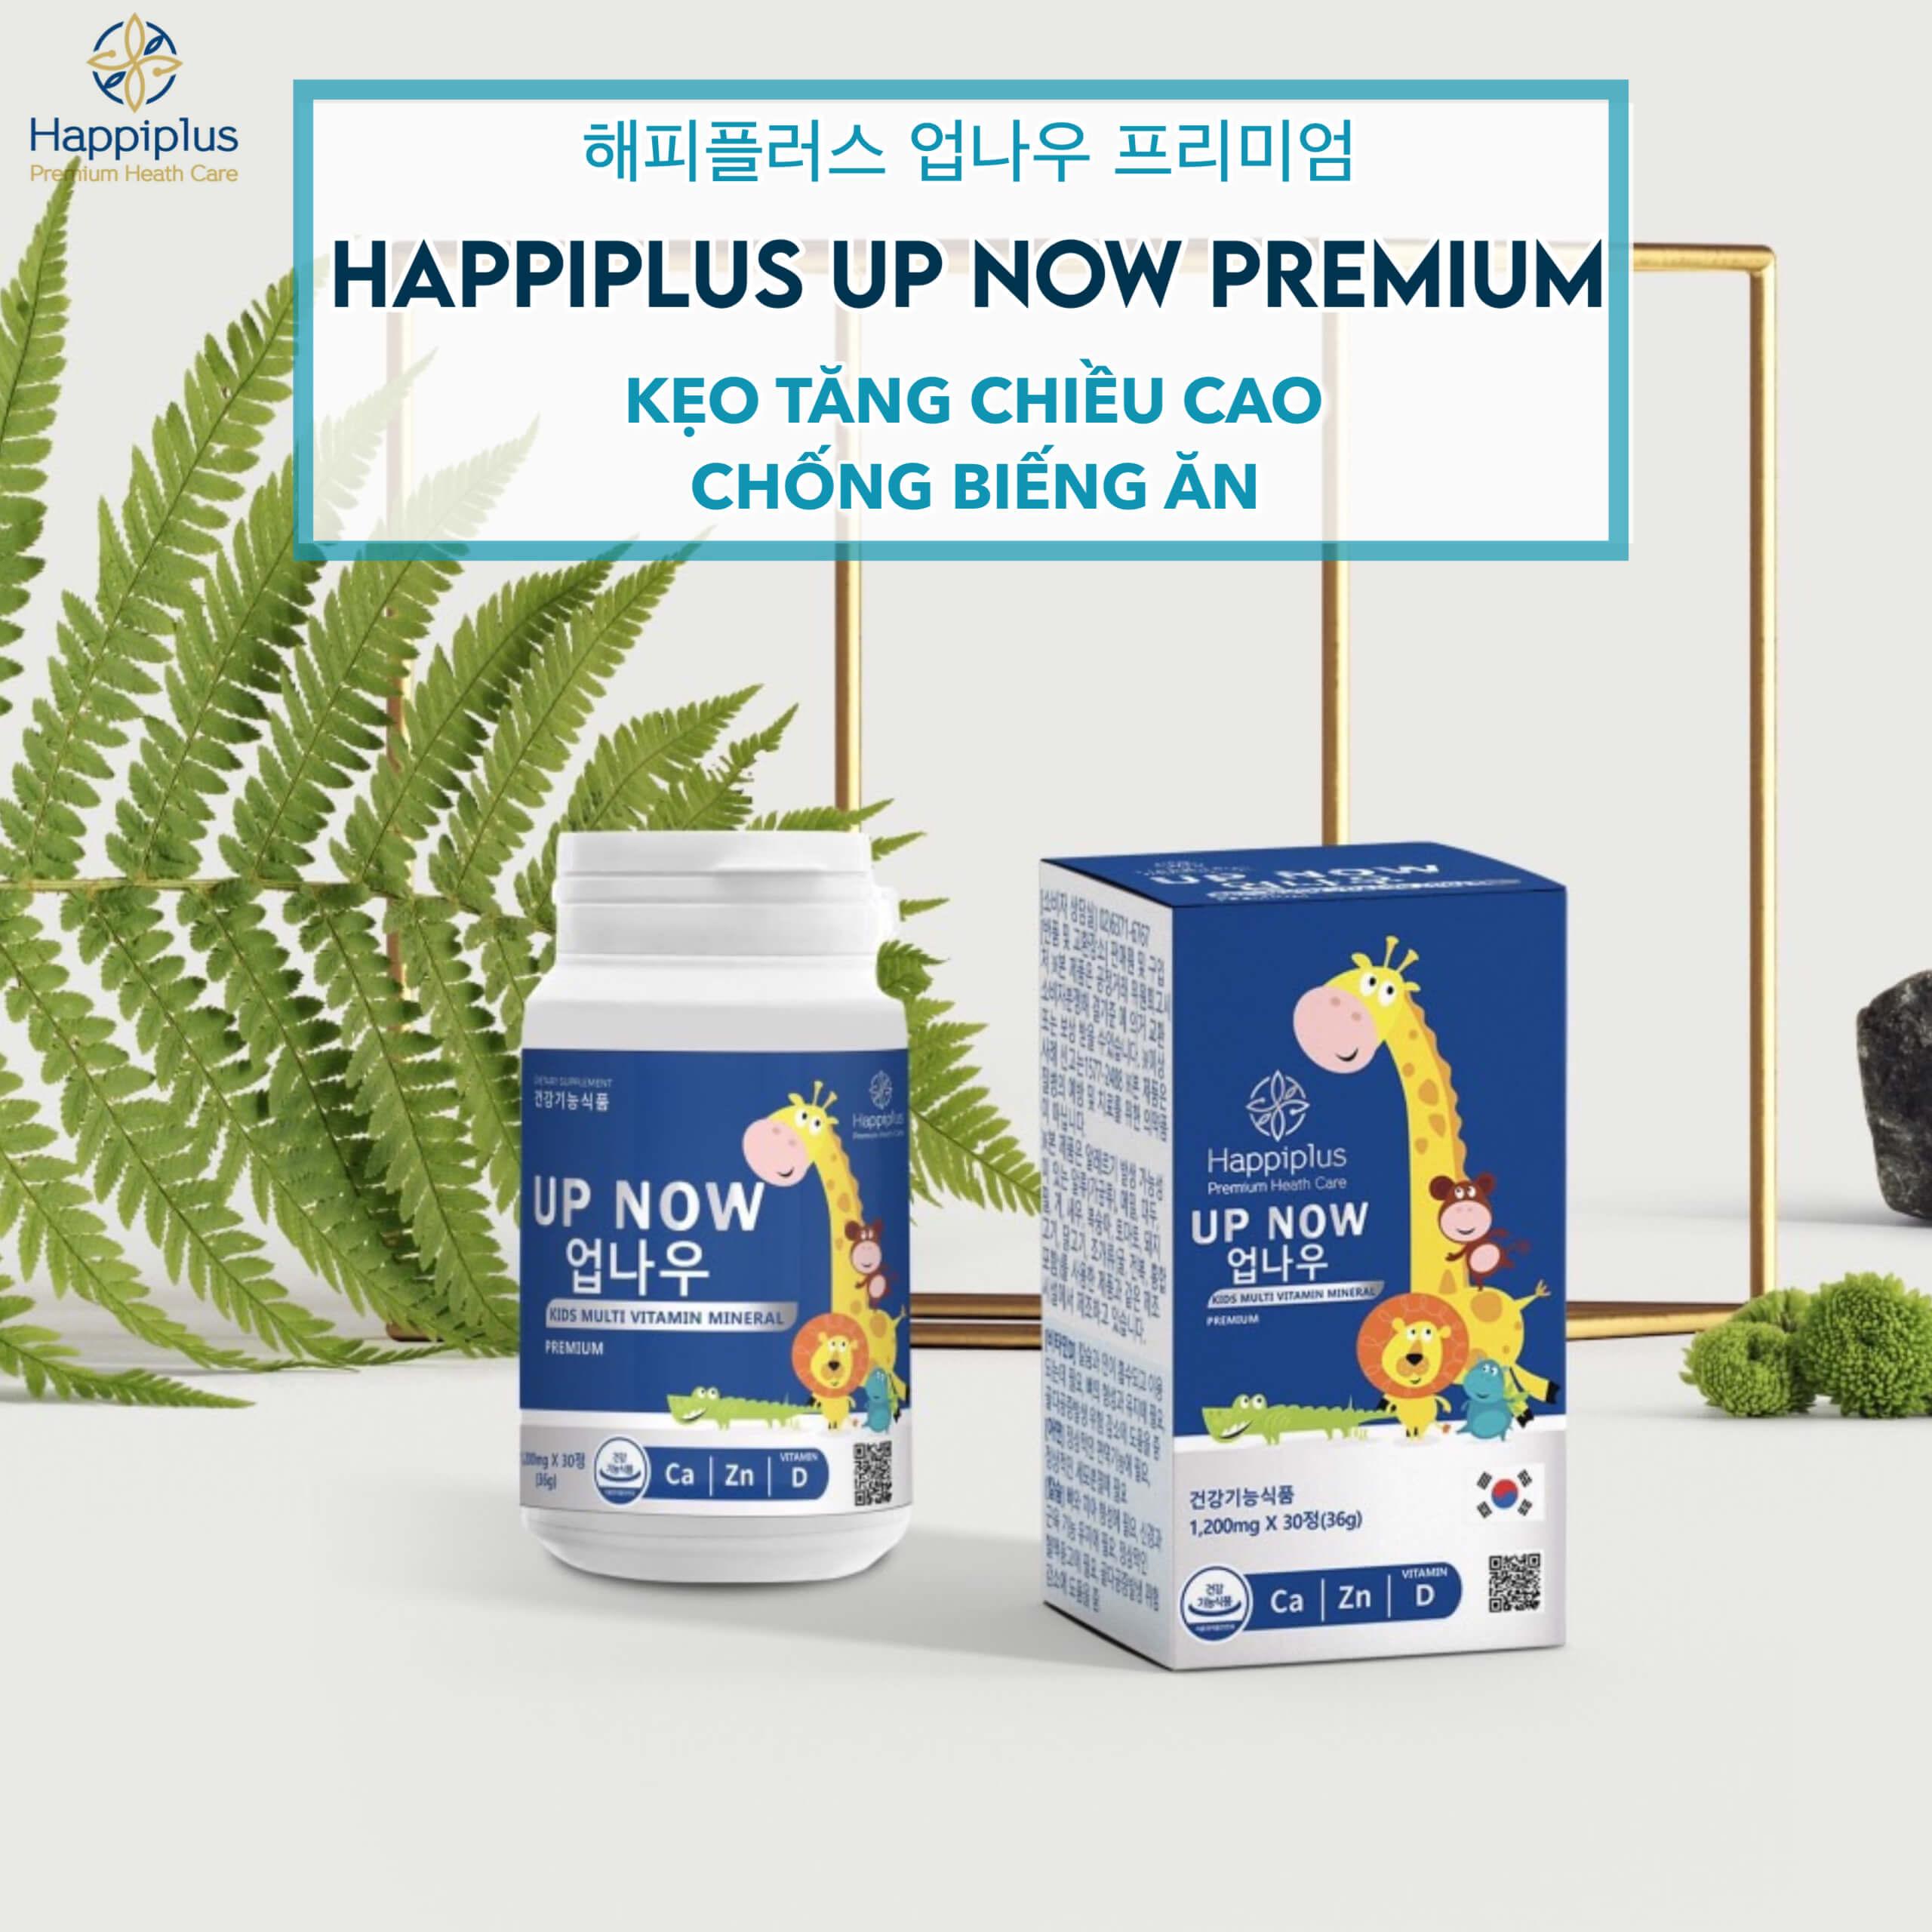 Kẹo tăng chiều cao Happilus UP NOW Premium